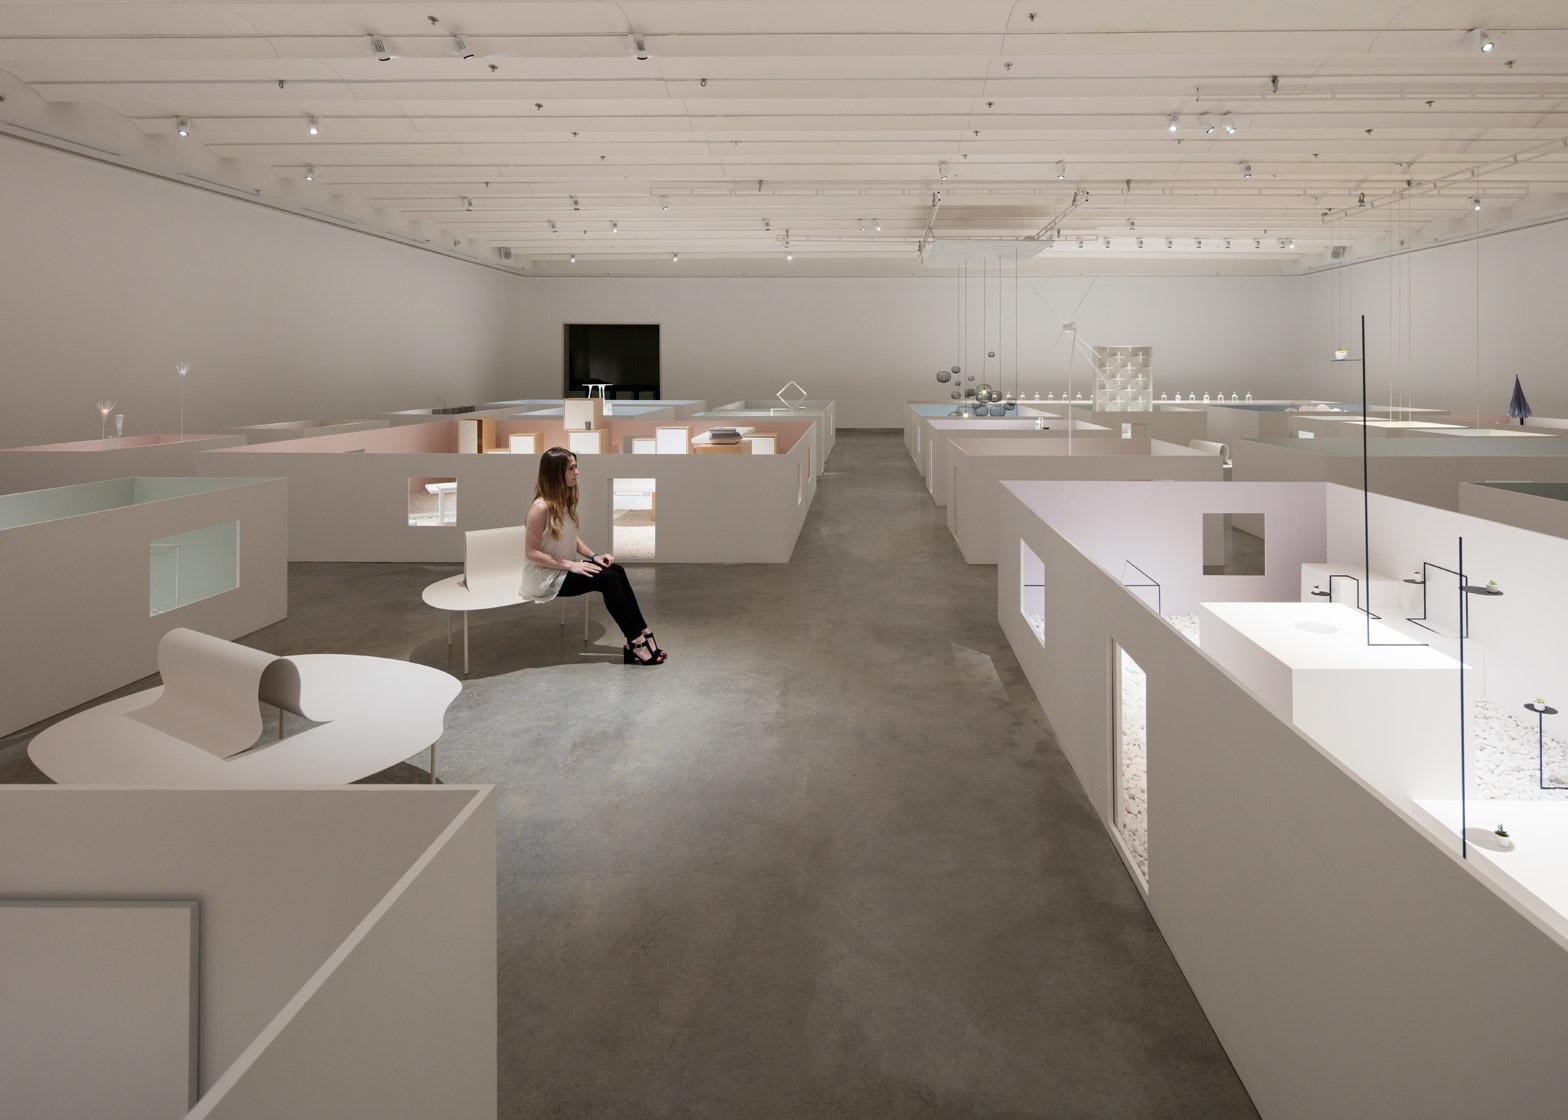 Музей работ Оки Сато - на фото посетитель музея